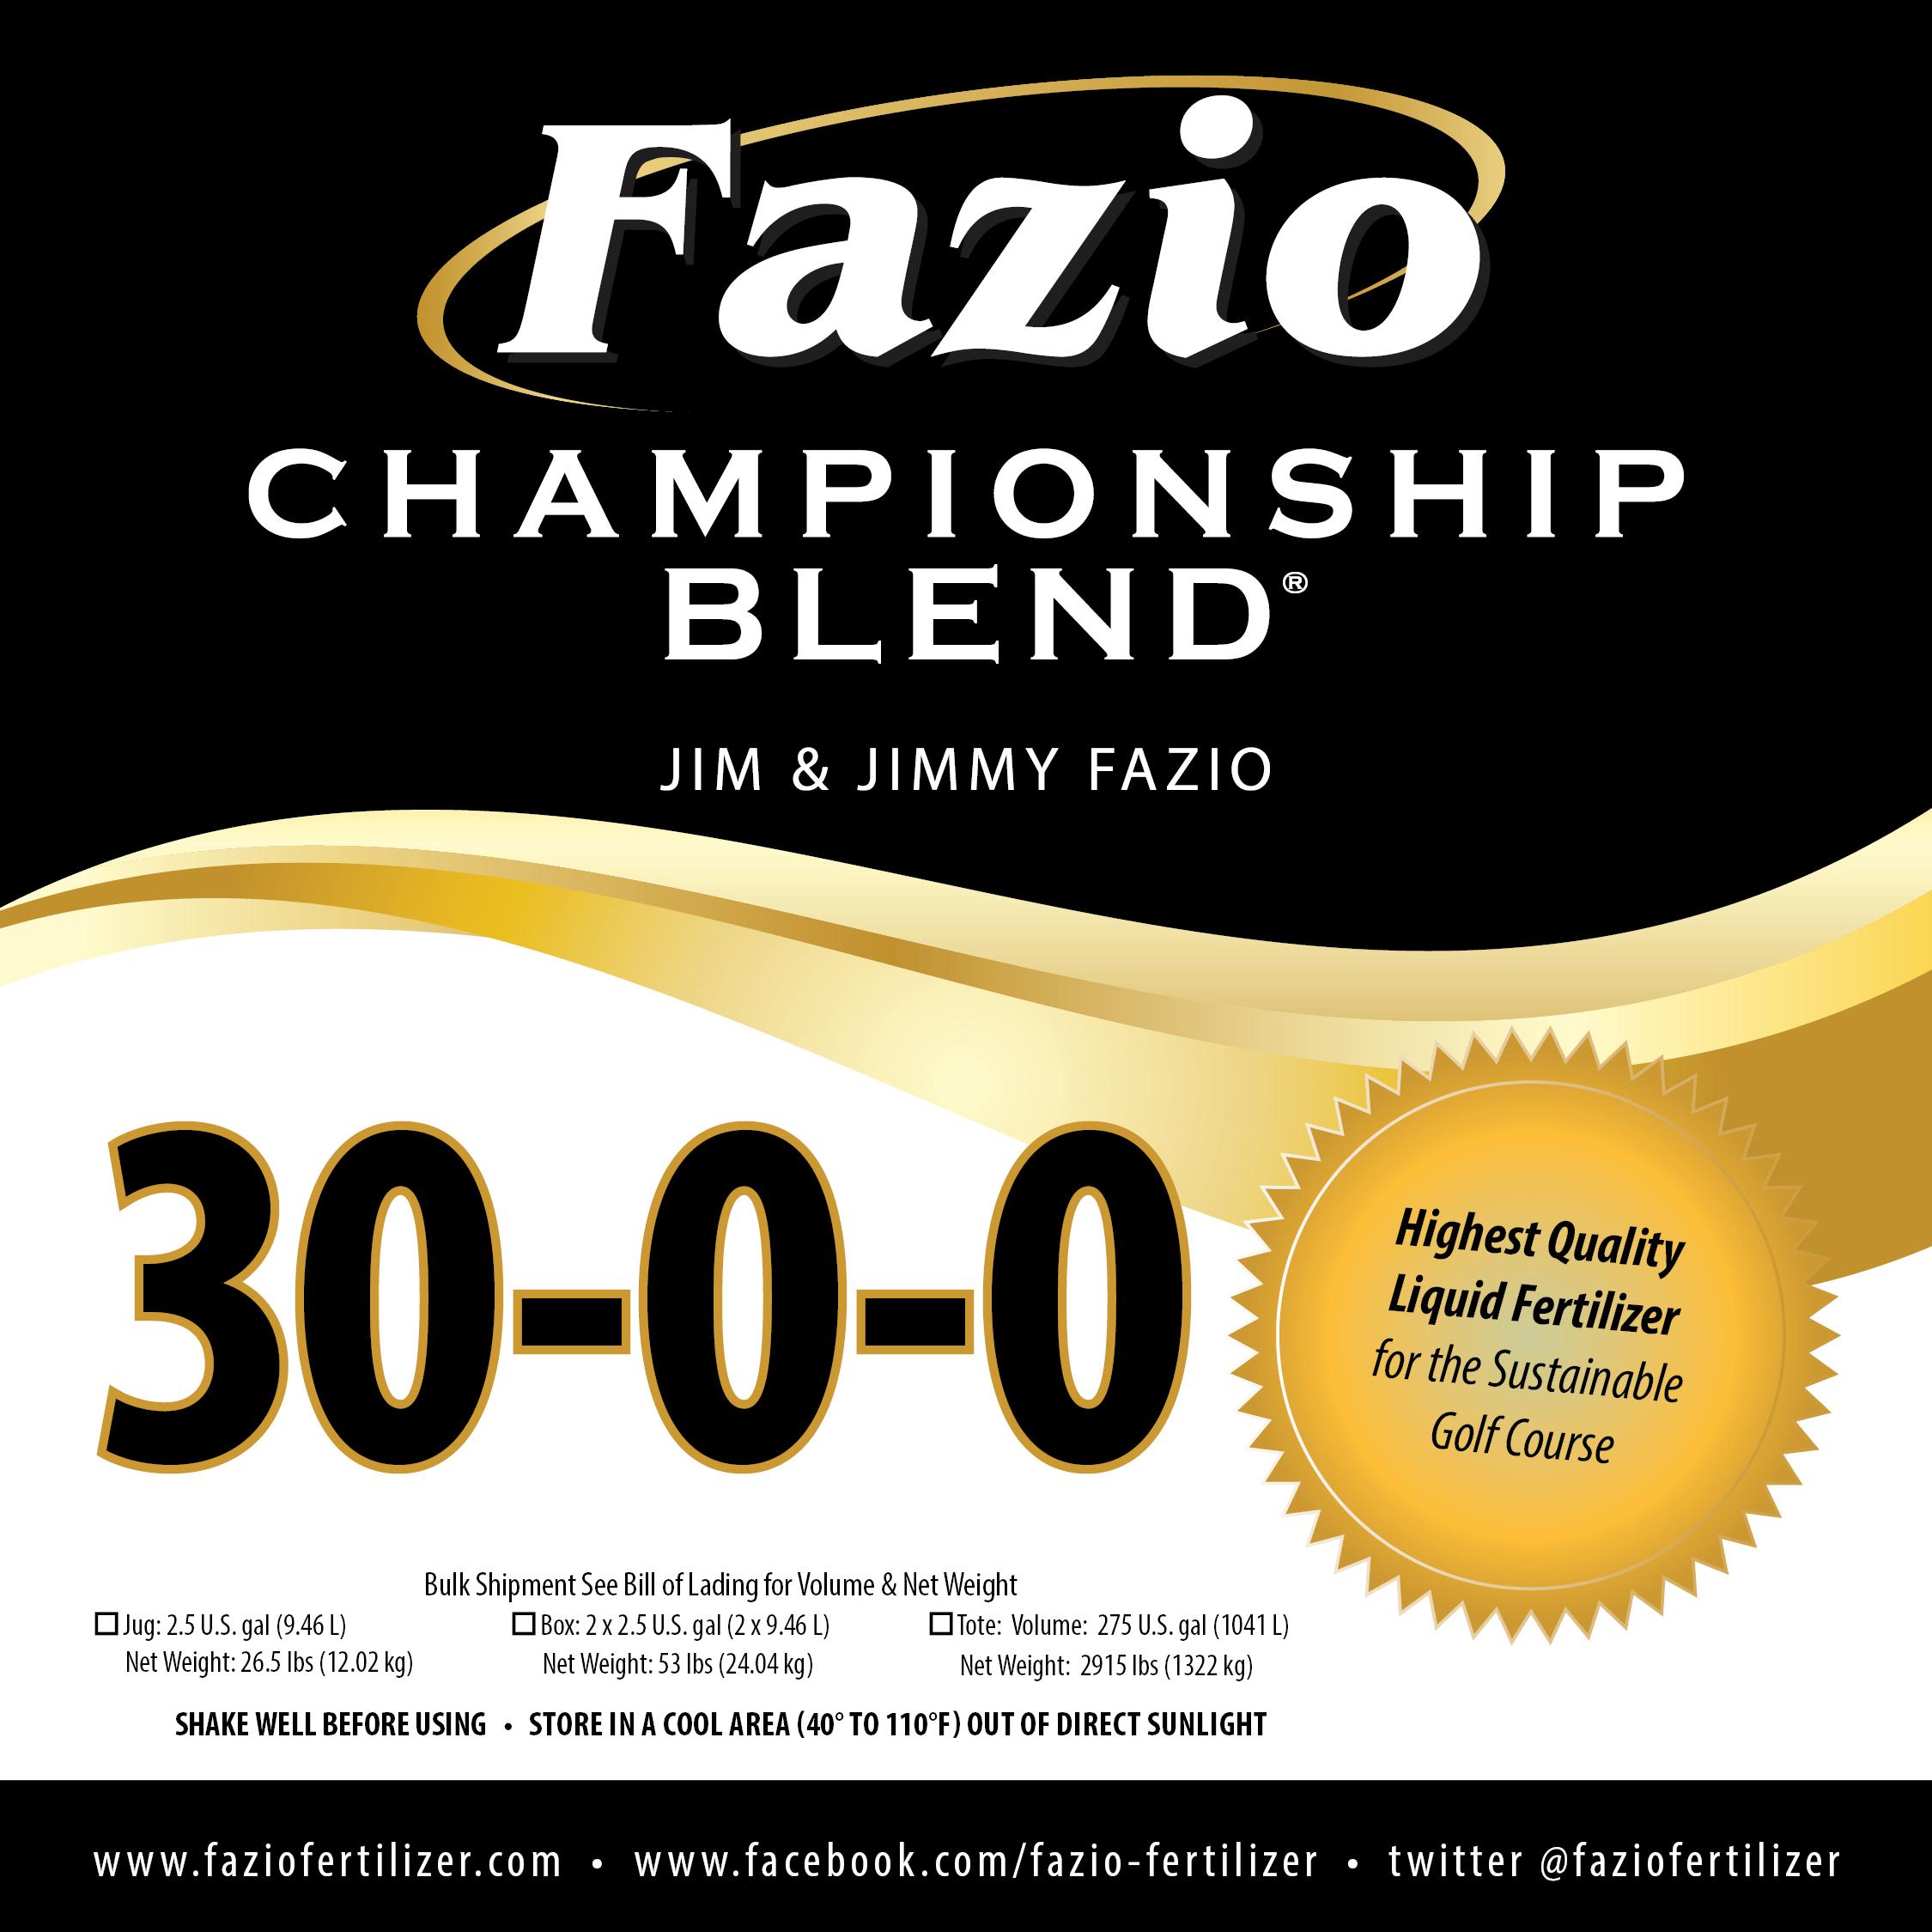 Fazio Championship Blend 30-0-0